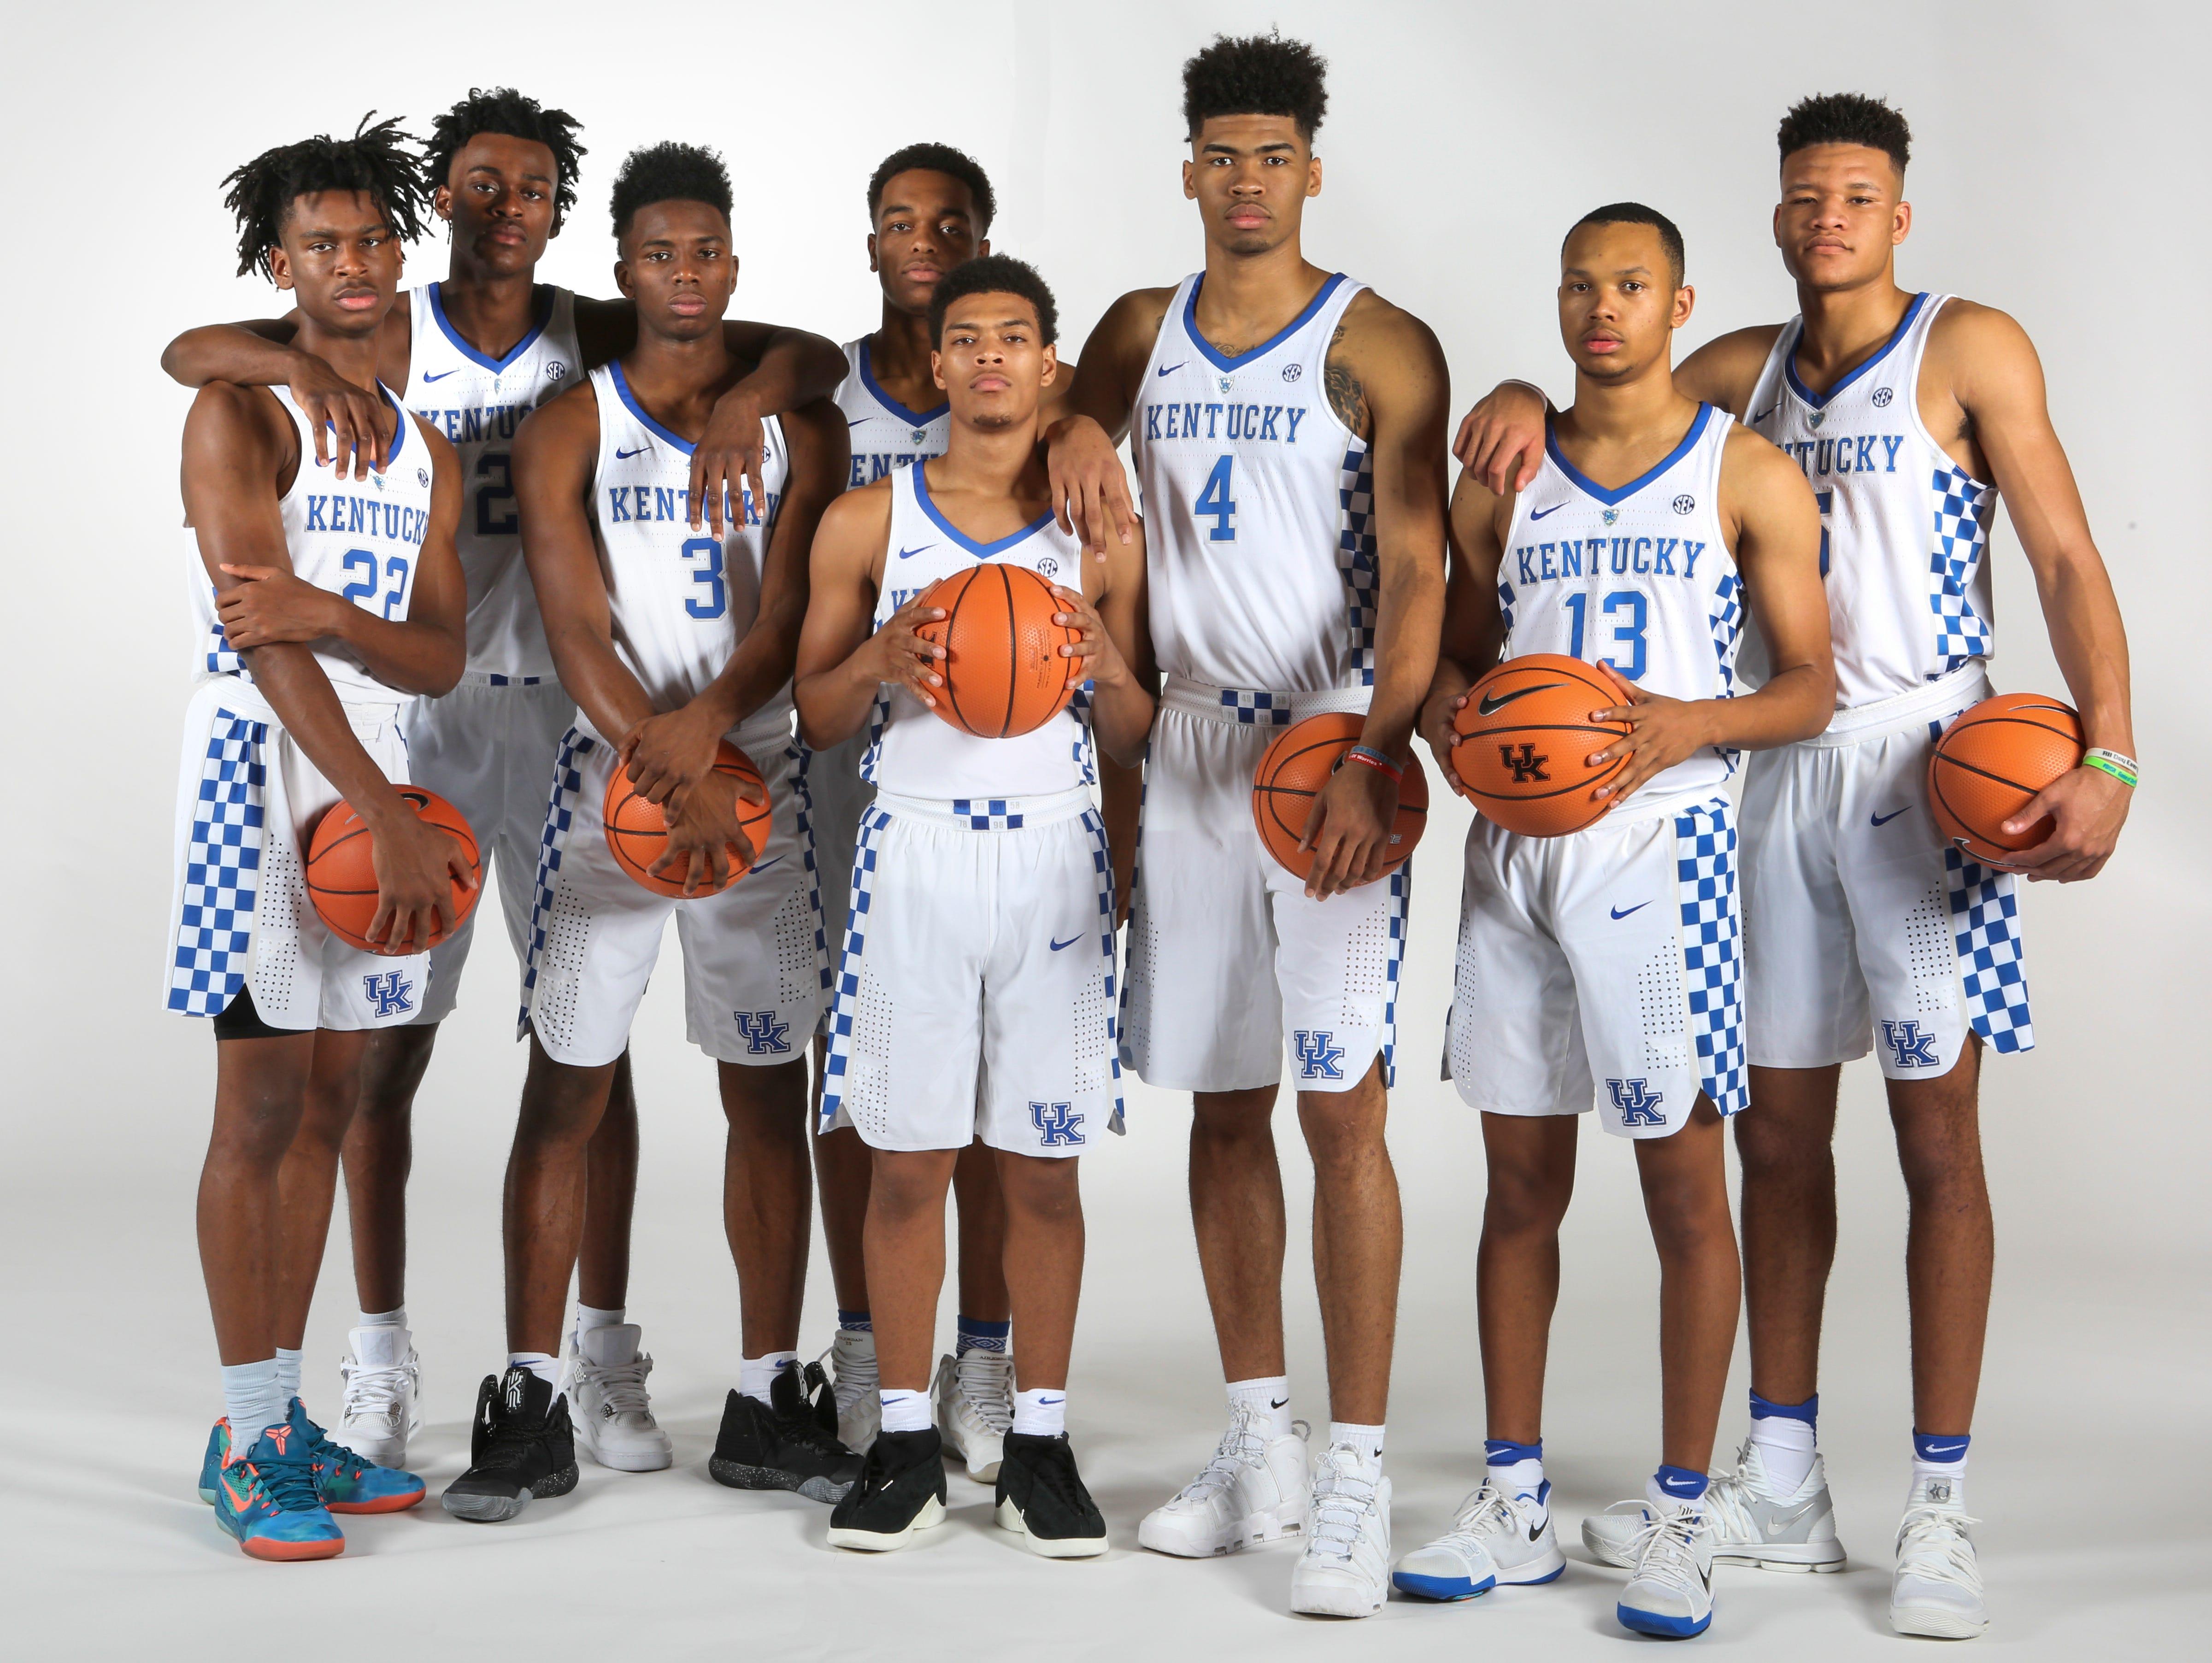 Kentucky freshmen Shai Gilgeous-Alexander, Jarred Vanderbilt, Hamidou Diallo, P.J. Washington, Quade Green, Nick Richards, Jemarl Baker, and Kevin Knox. September 18, 2017